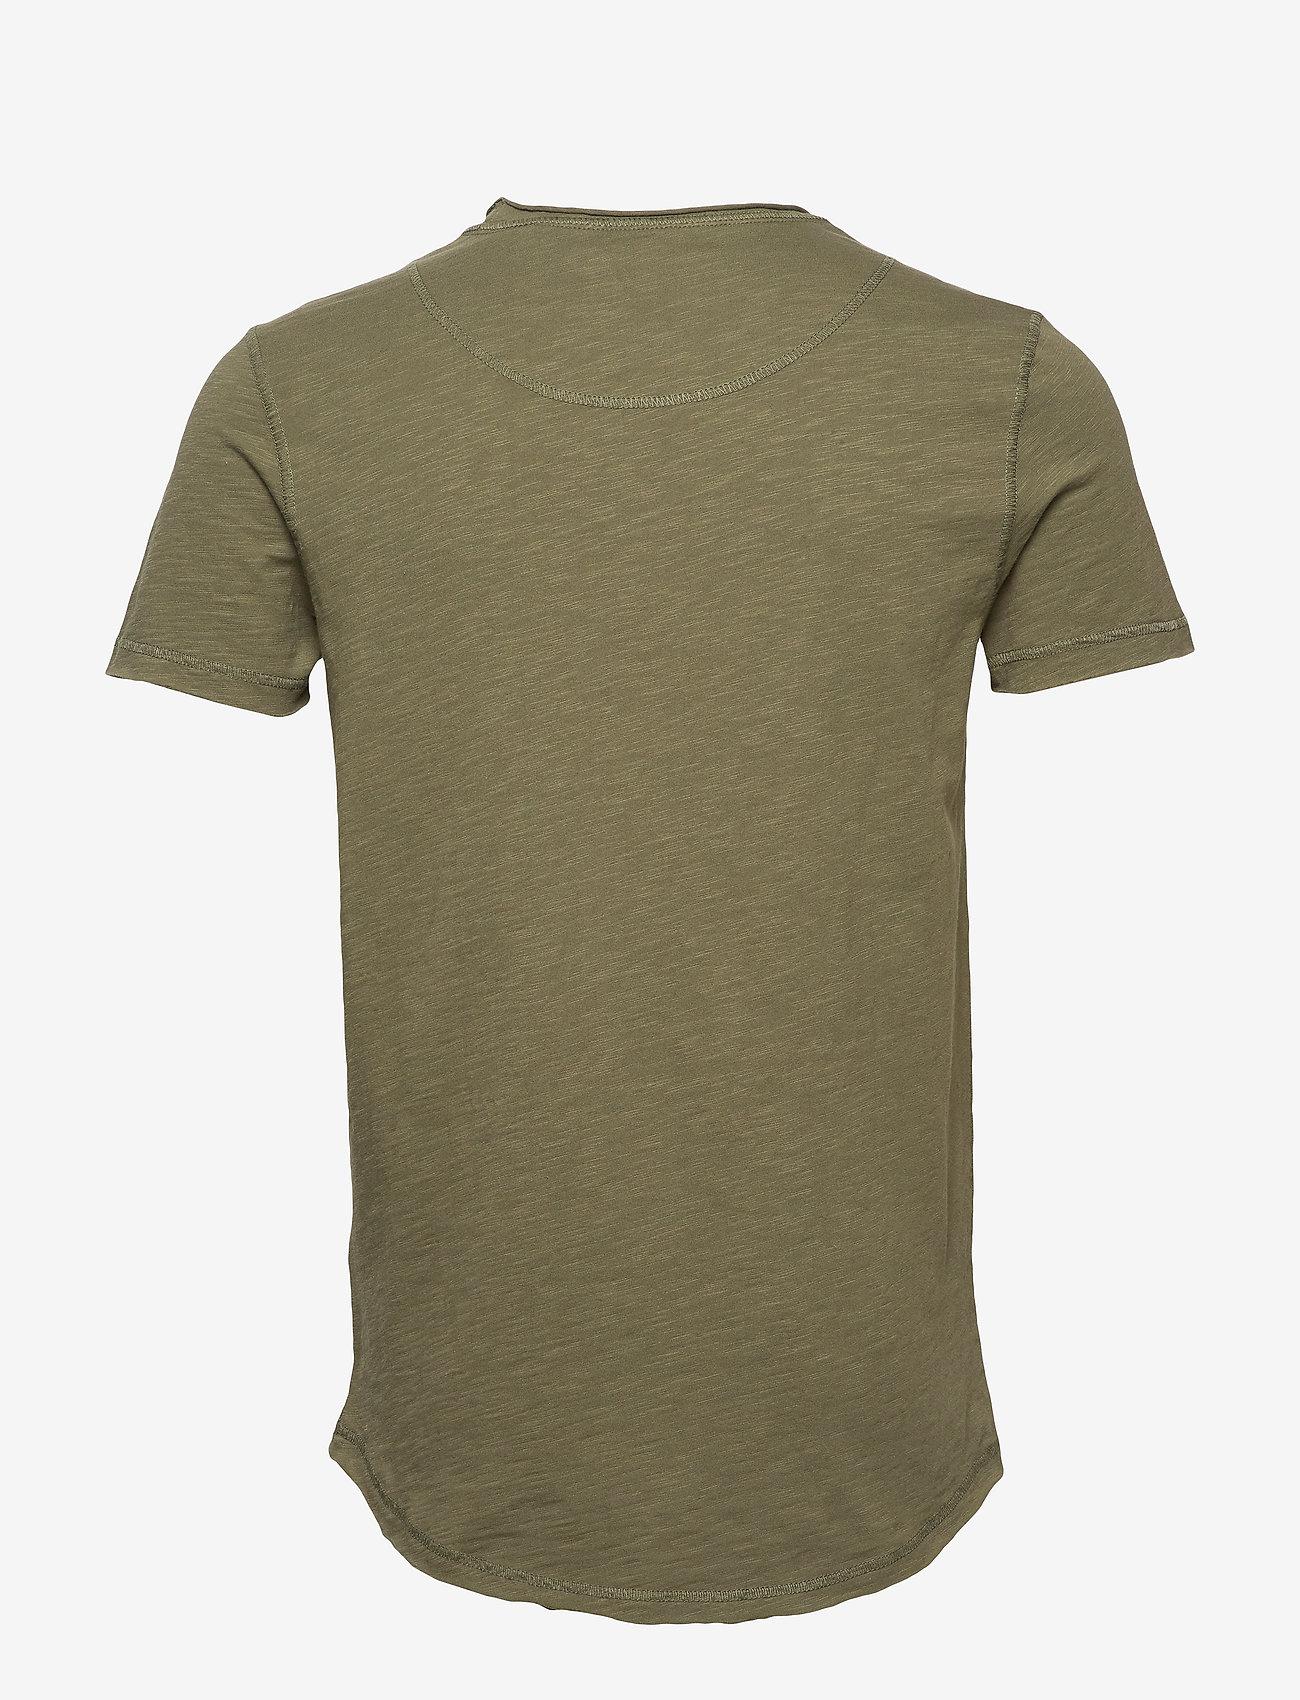 Gabba Konrad Slub S/S Tee - T-skjorter ARMY - Menn Klær